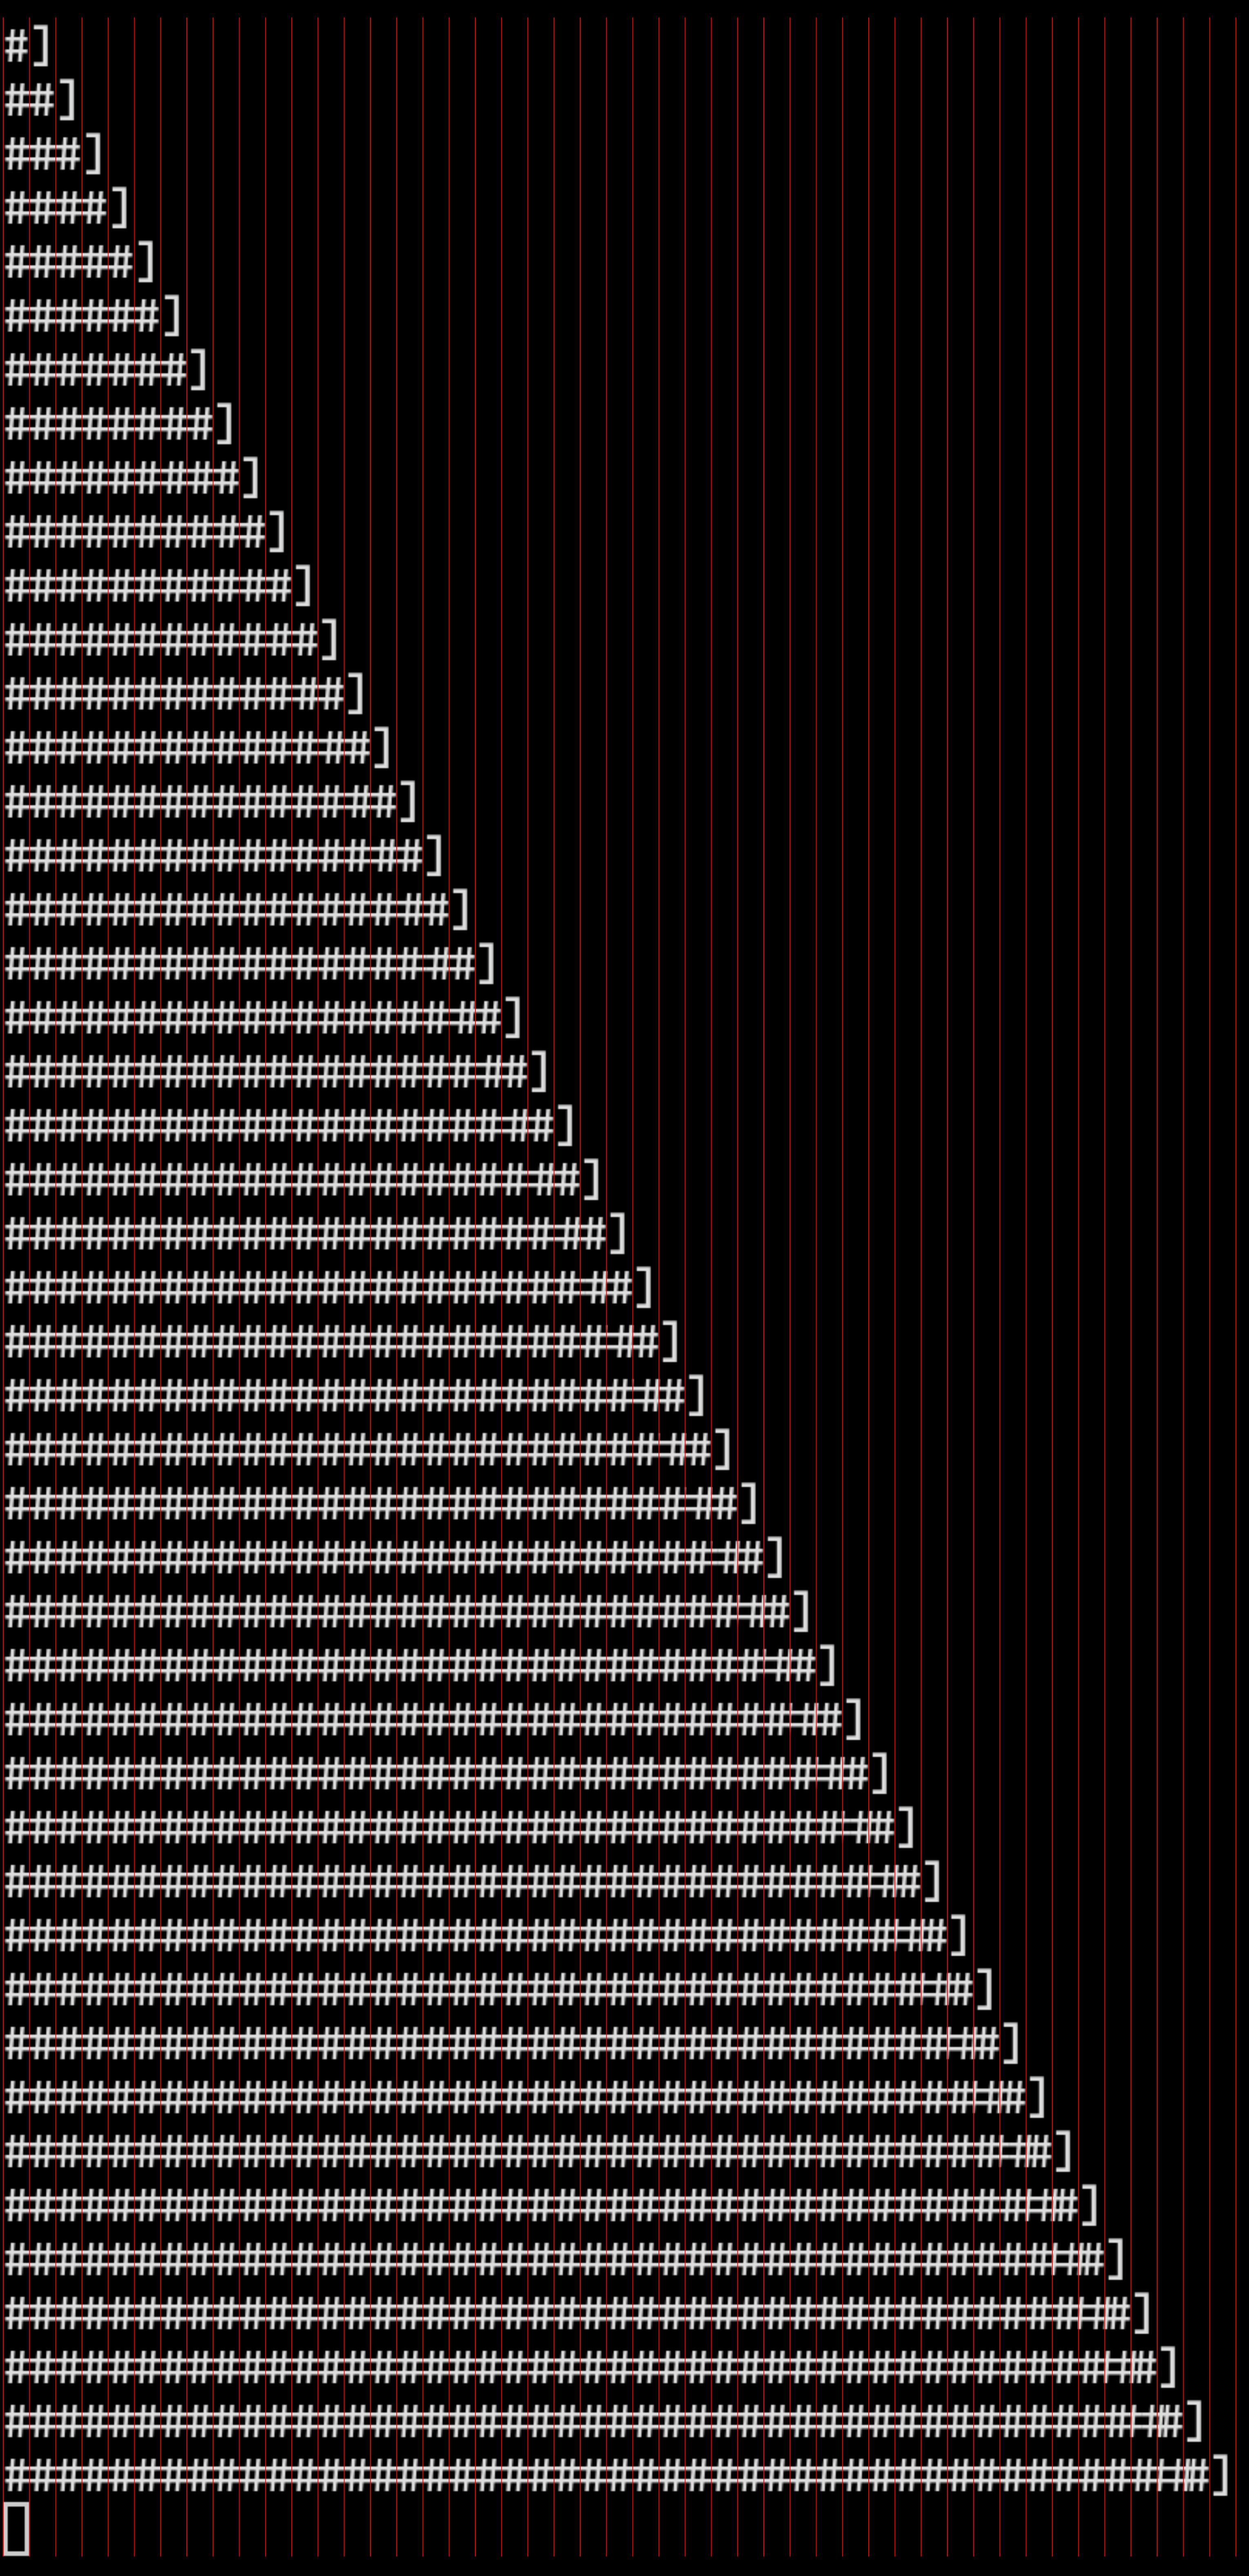 cascadia-code-artefact-test1-lines